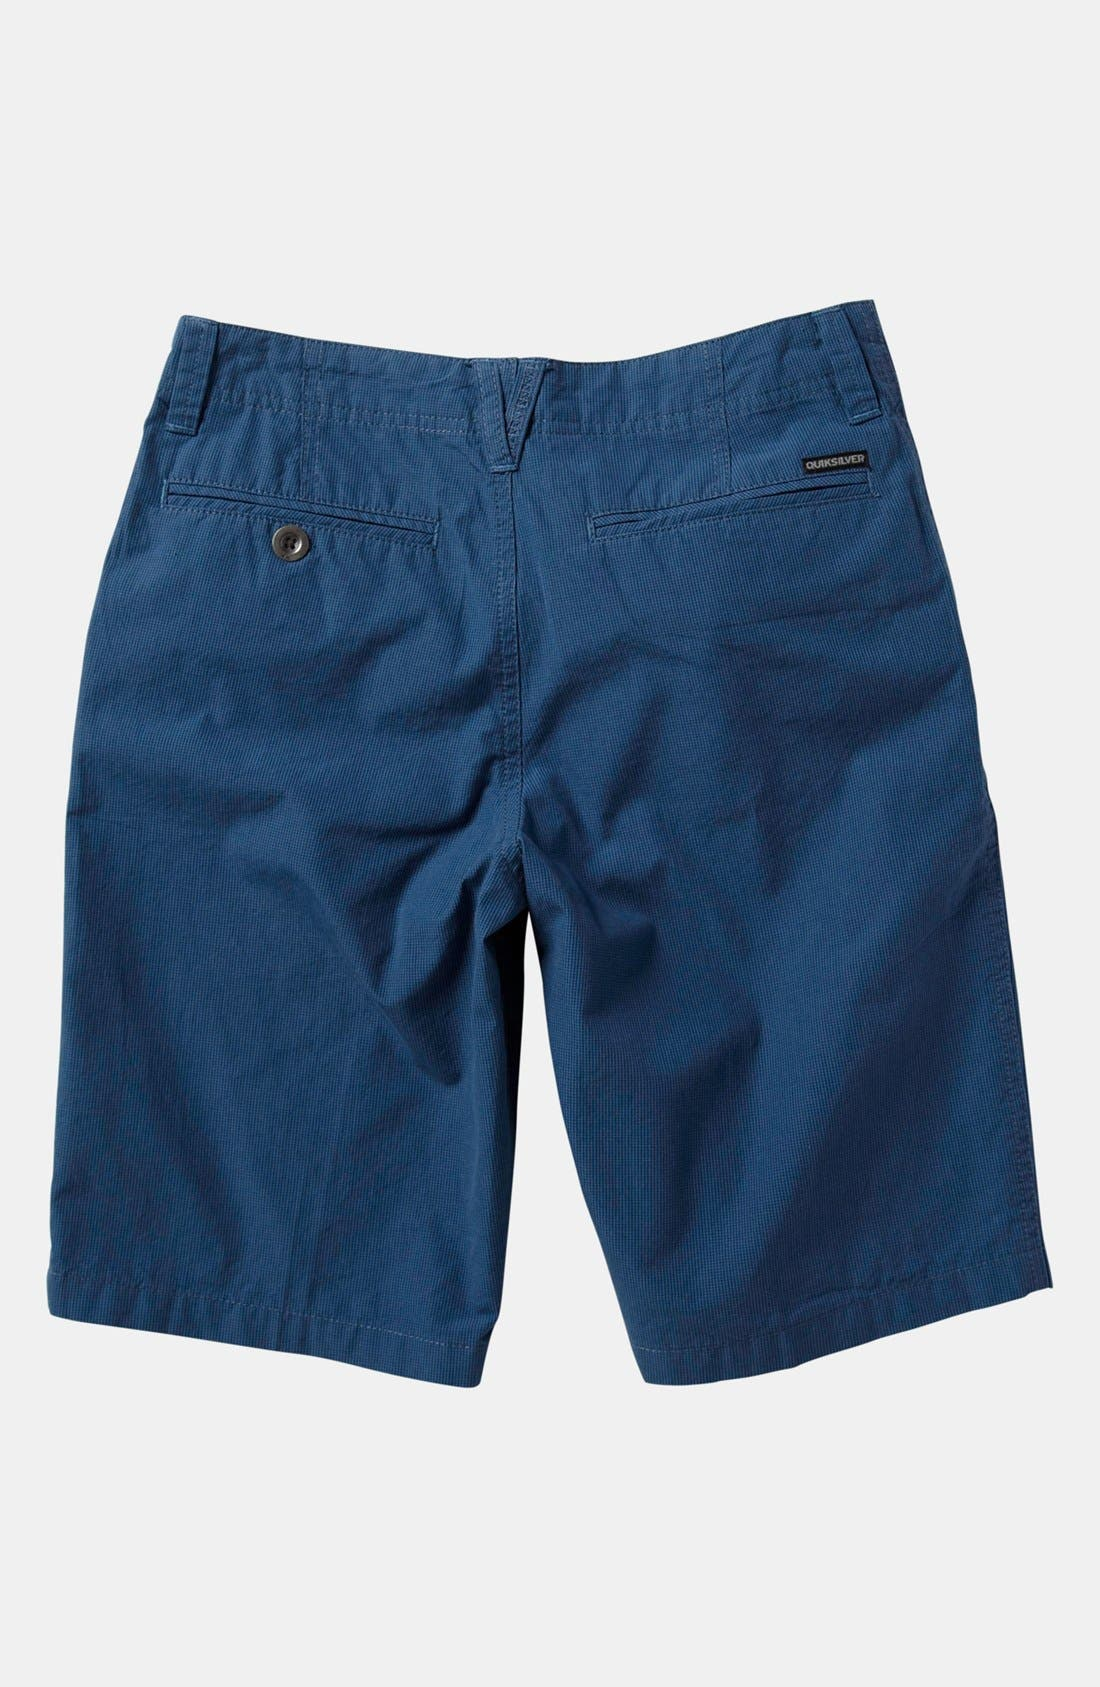 Alternate Image 2  - Quiksilver 'Nugget' Shorts (Big Boys)